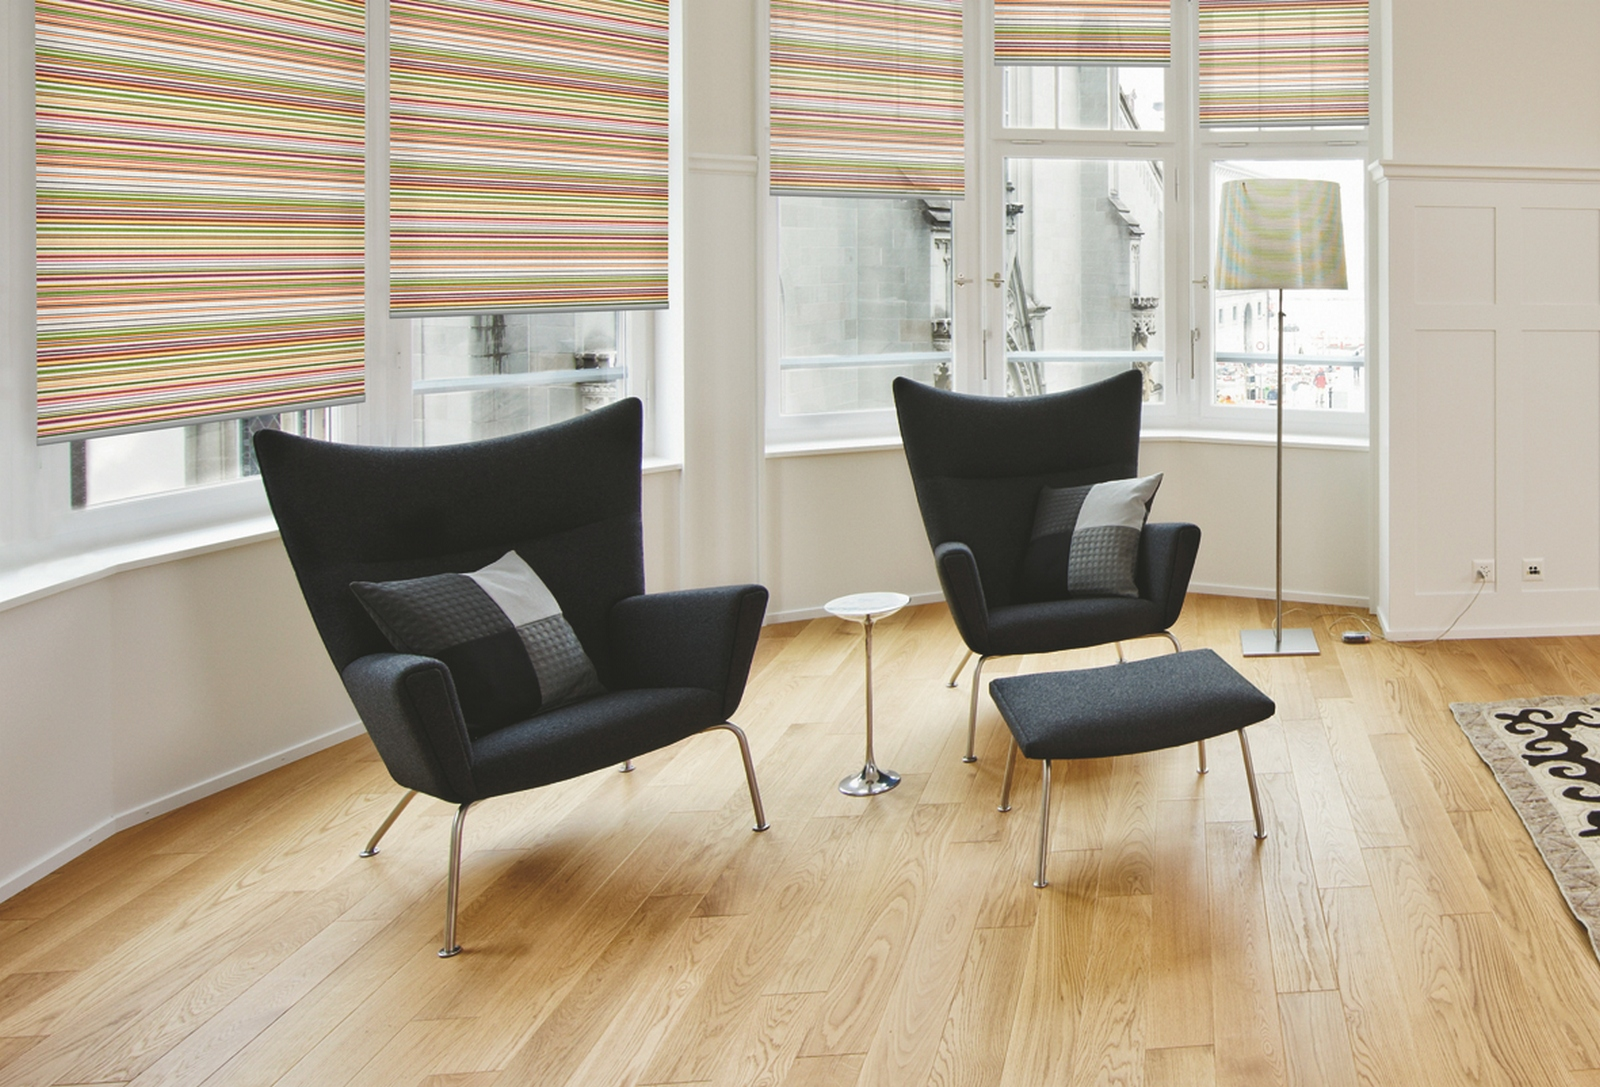 baby screen une l gante finesse dynastore fabricant de stores bordeaux. Black Bedroom Furniture Sets. Home Design Ideas